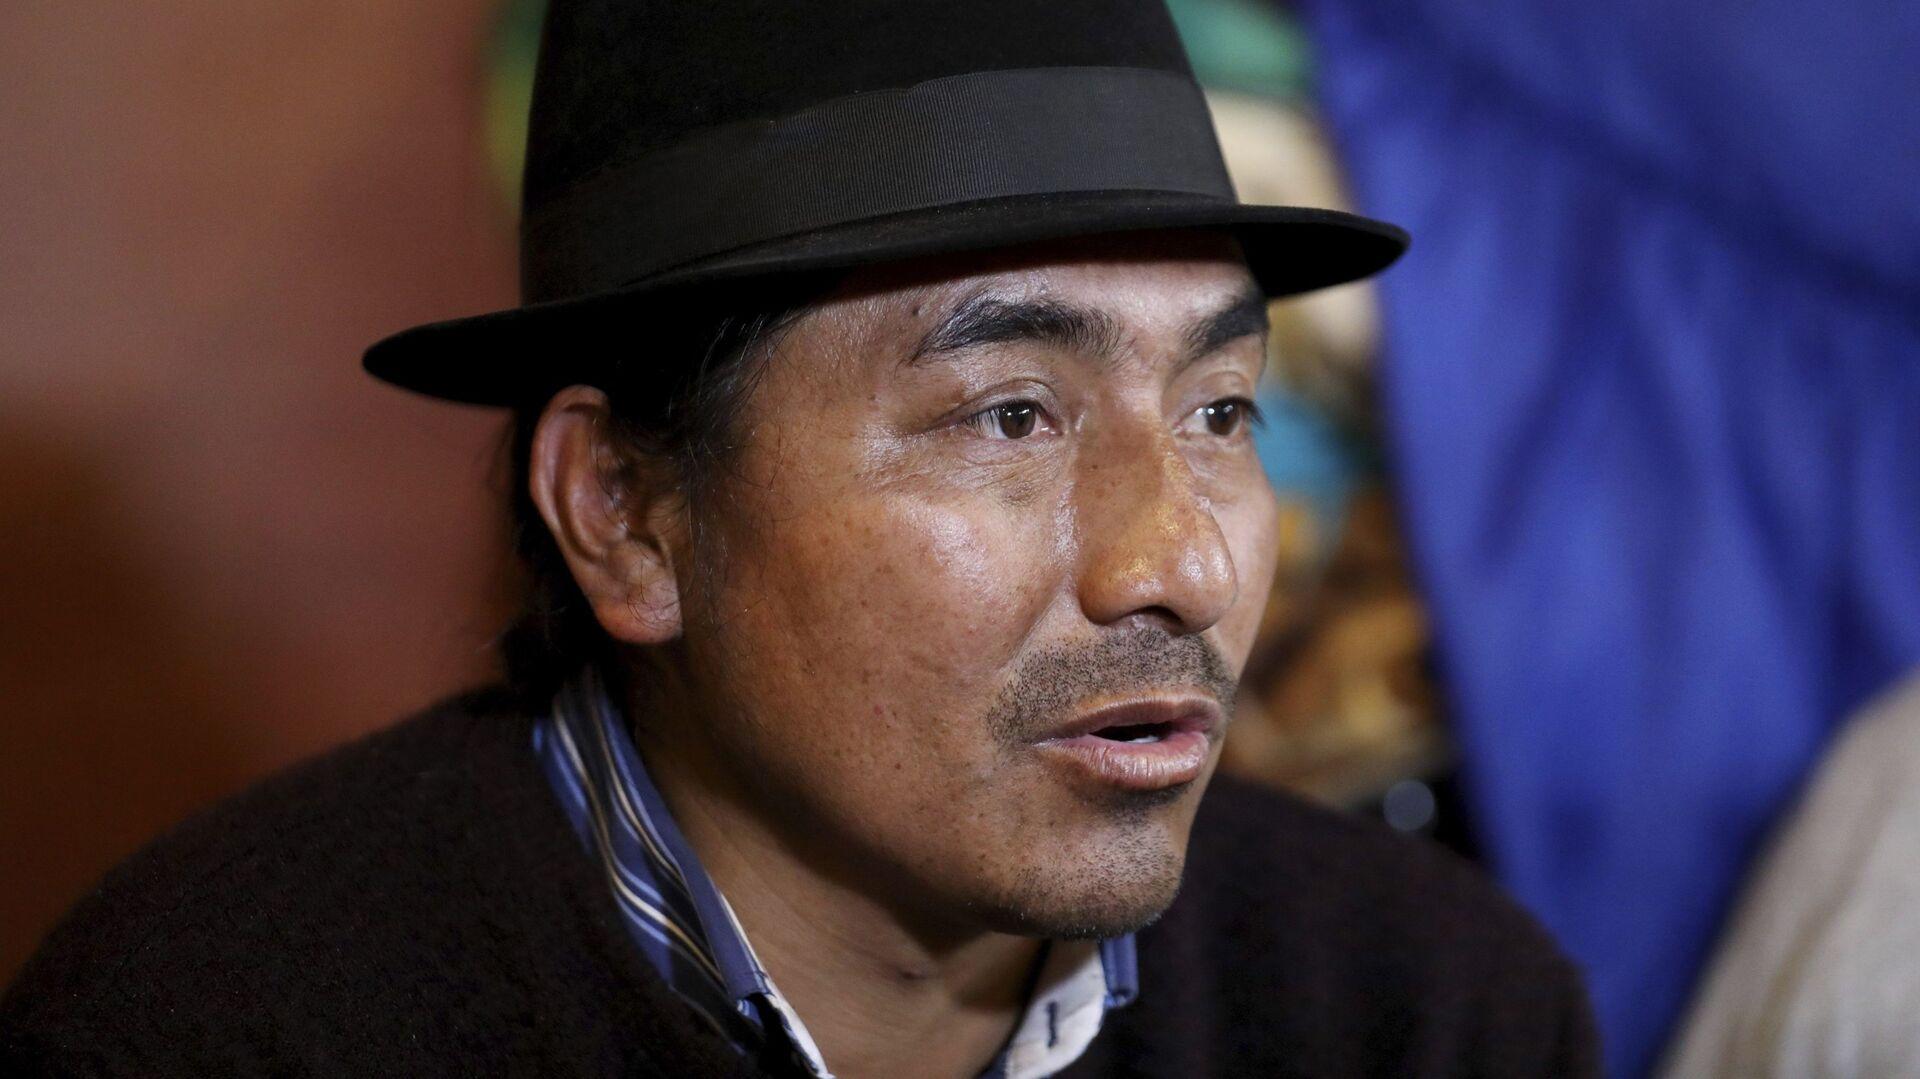 Leonidas Iza, dirigente indígena de Ecuador - Sputnik Mundo, 1920, 28.06.2021